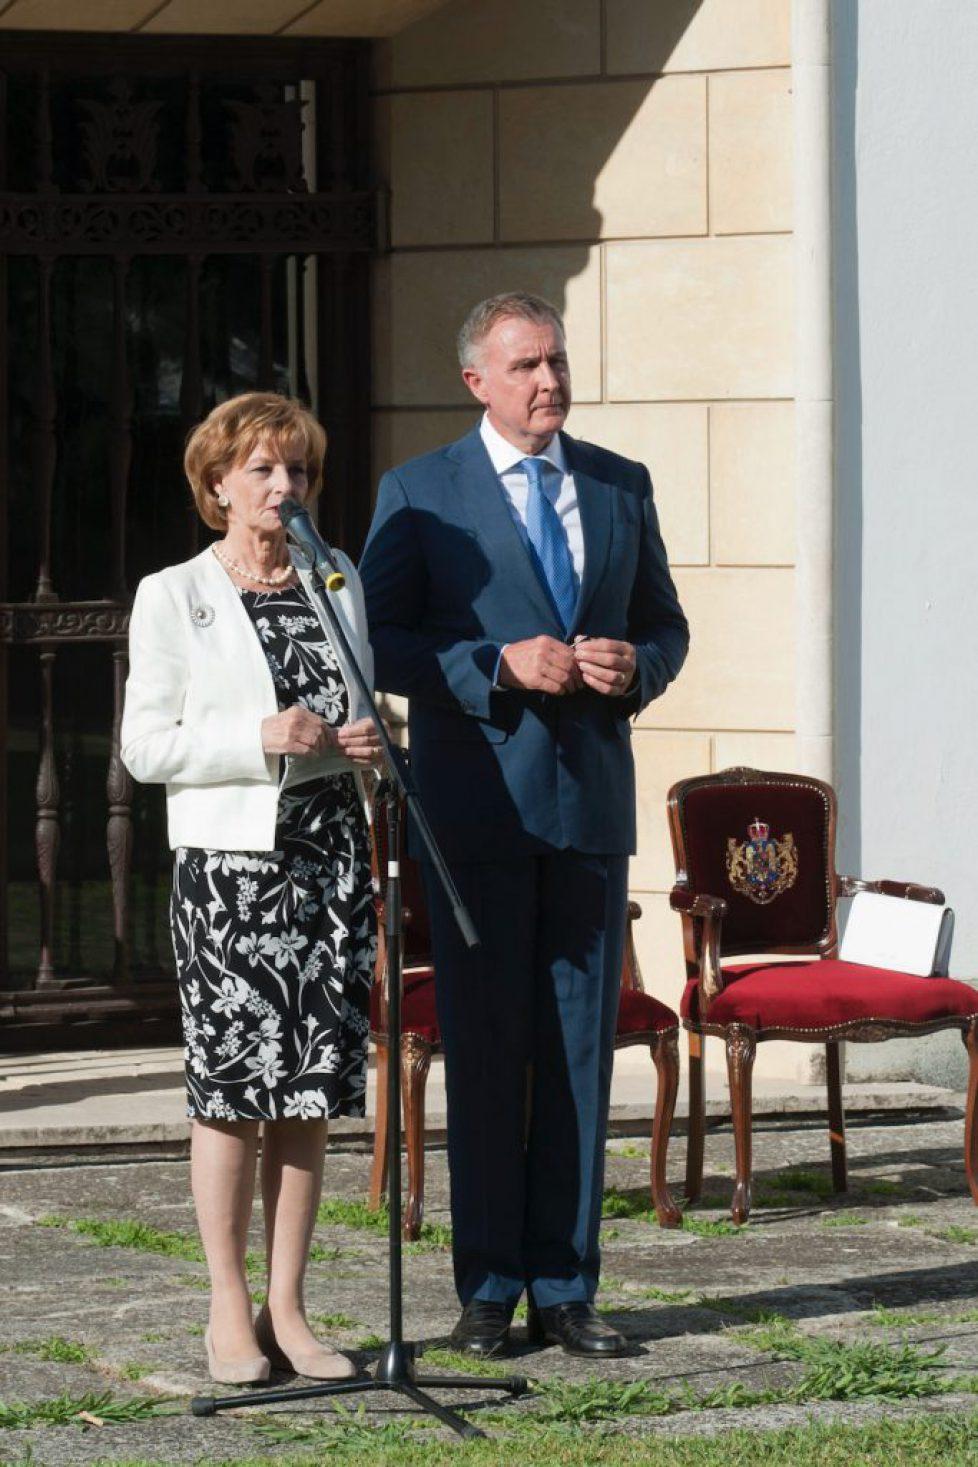 202197-Seara-Palatului-Elisabeta-World-Duchenne-Awareness-Majestatea-Sa-Margareta-Custodele-Coroanei-Principele-Radu-_ANG4435